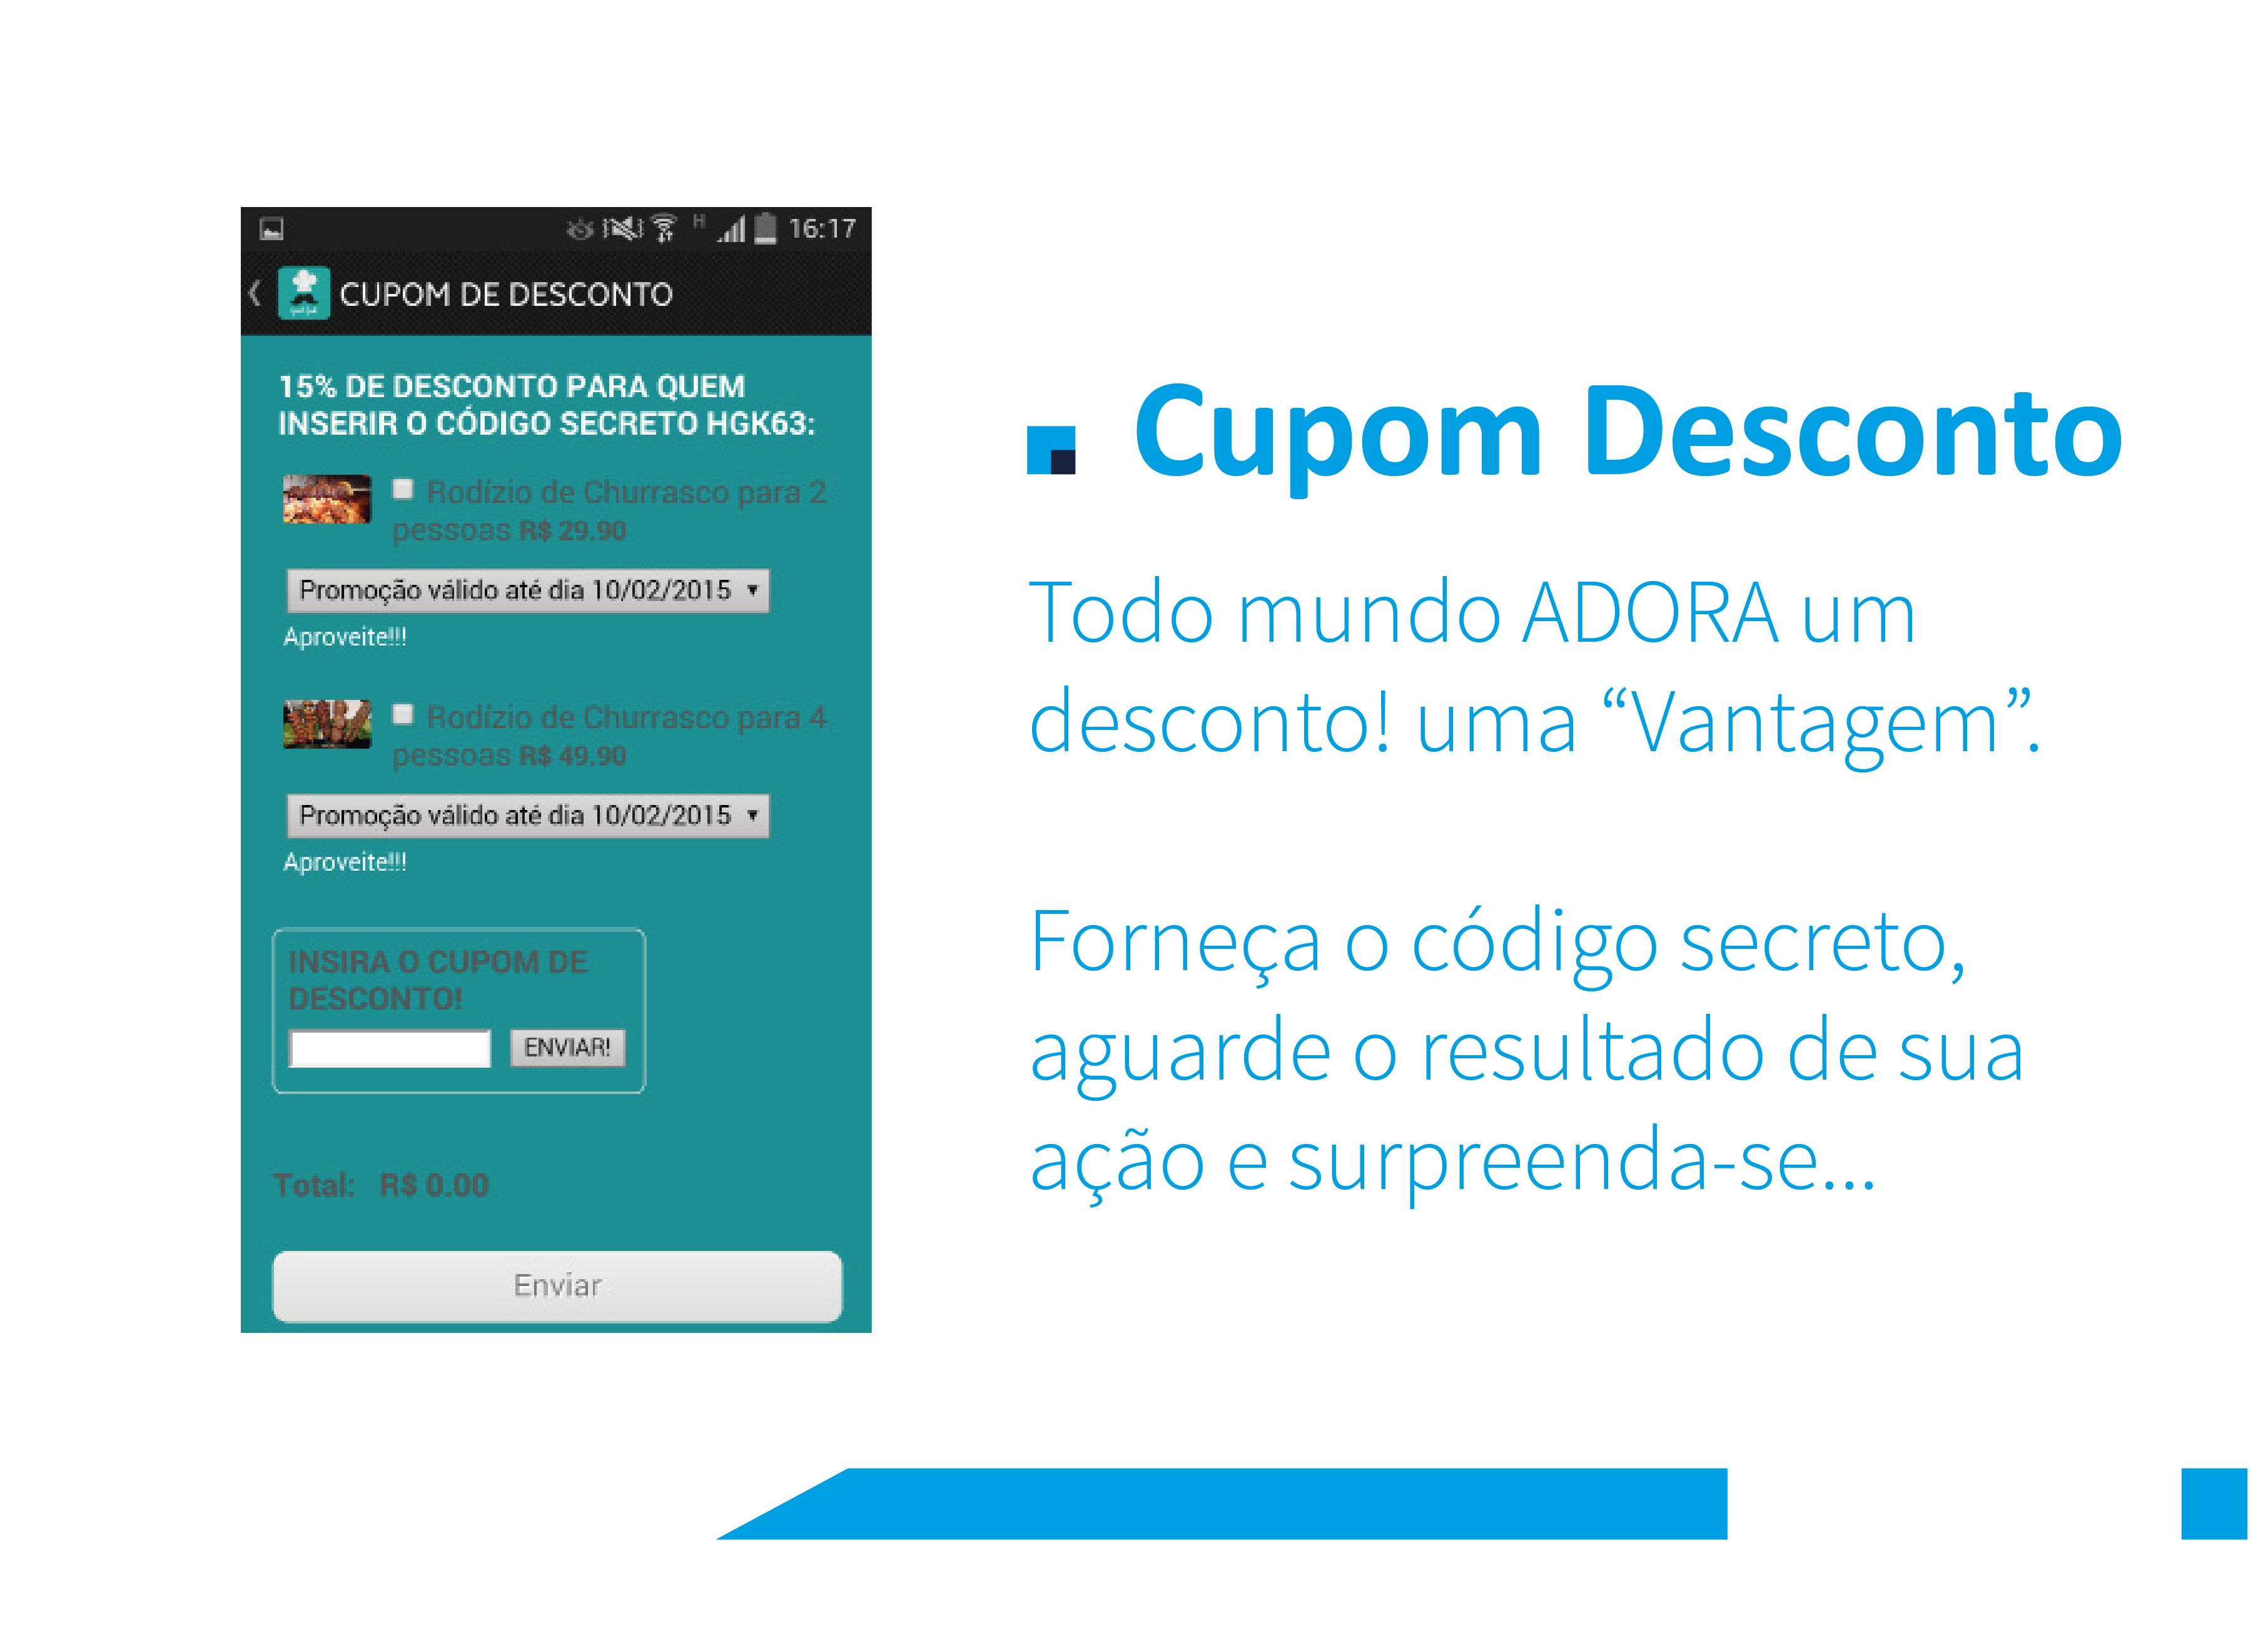 Cupon Desconto